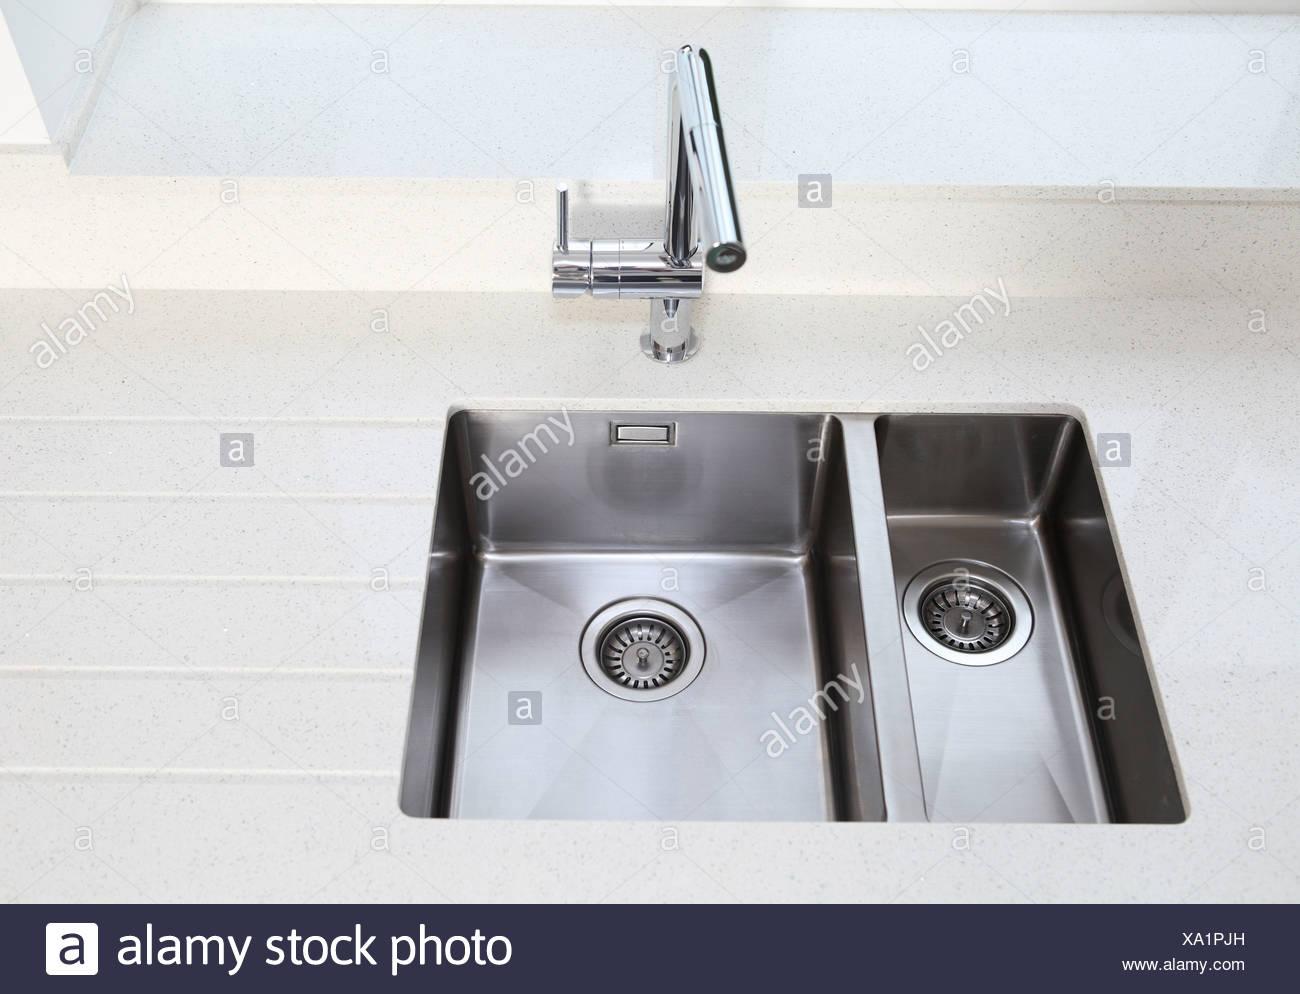 Kitchen sink - Stock Image